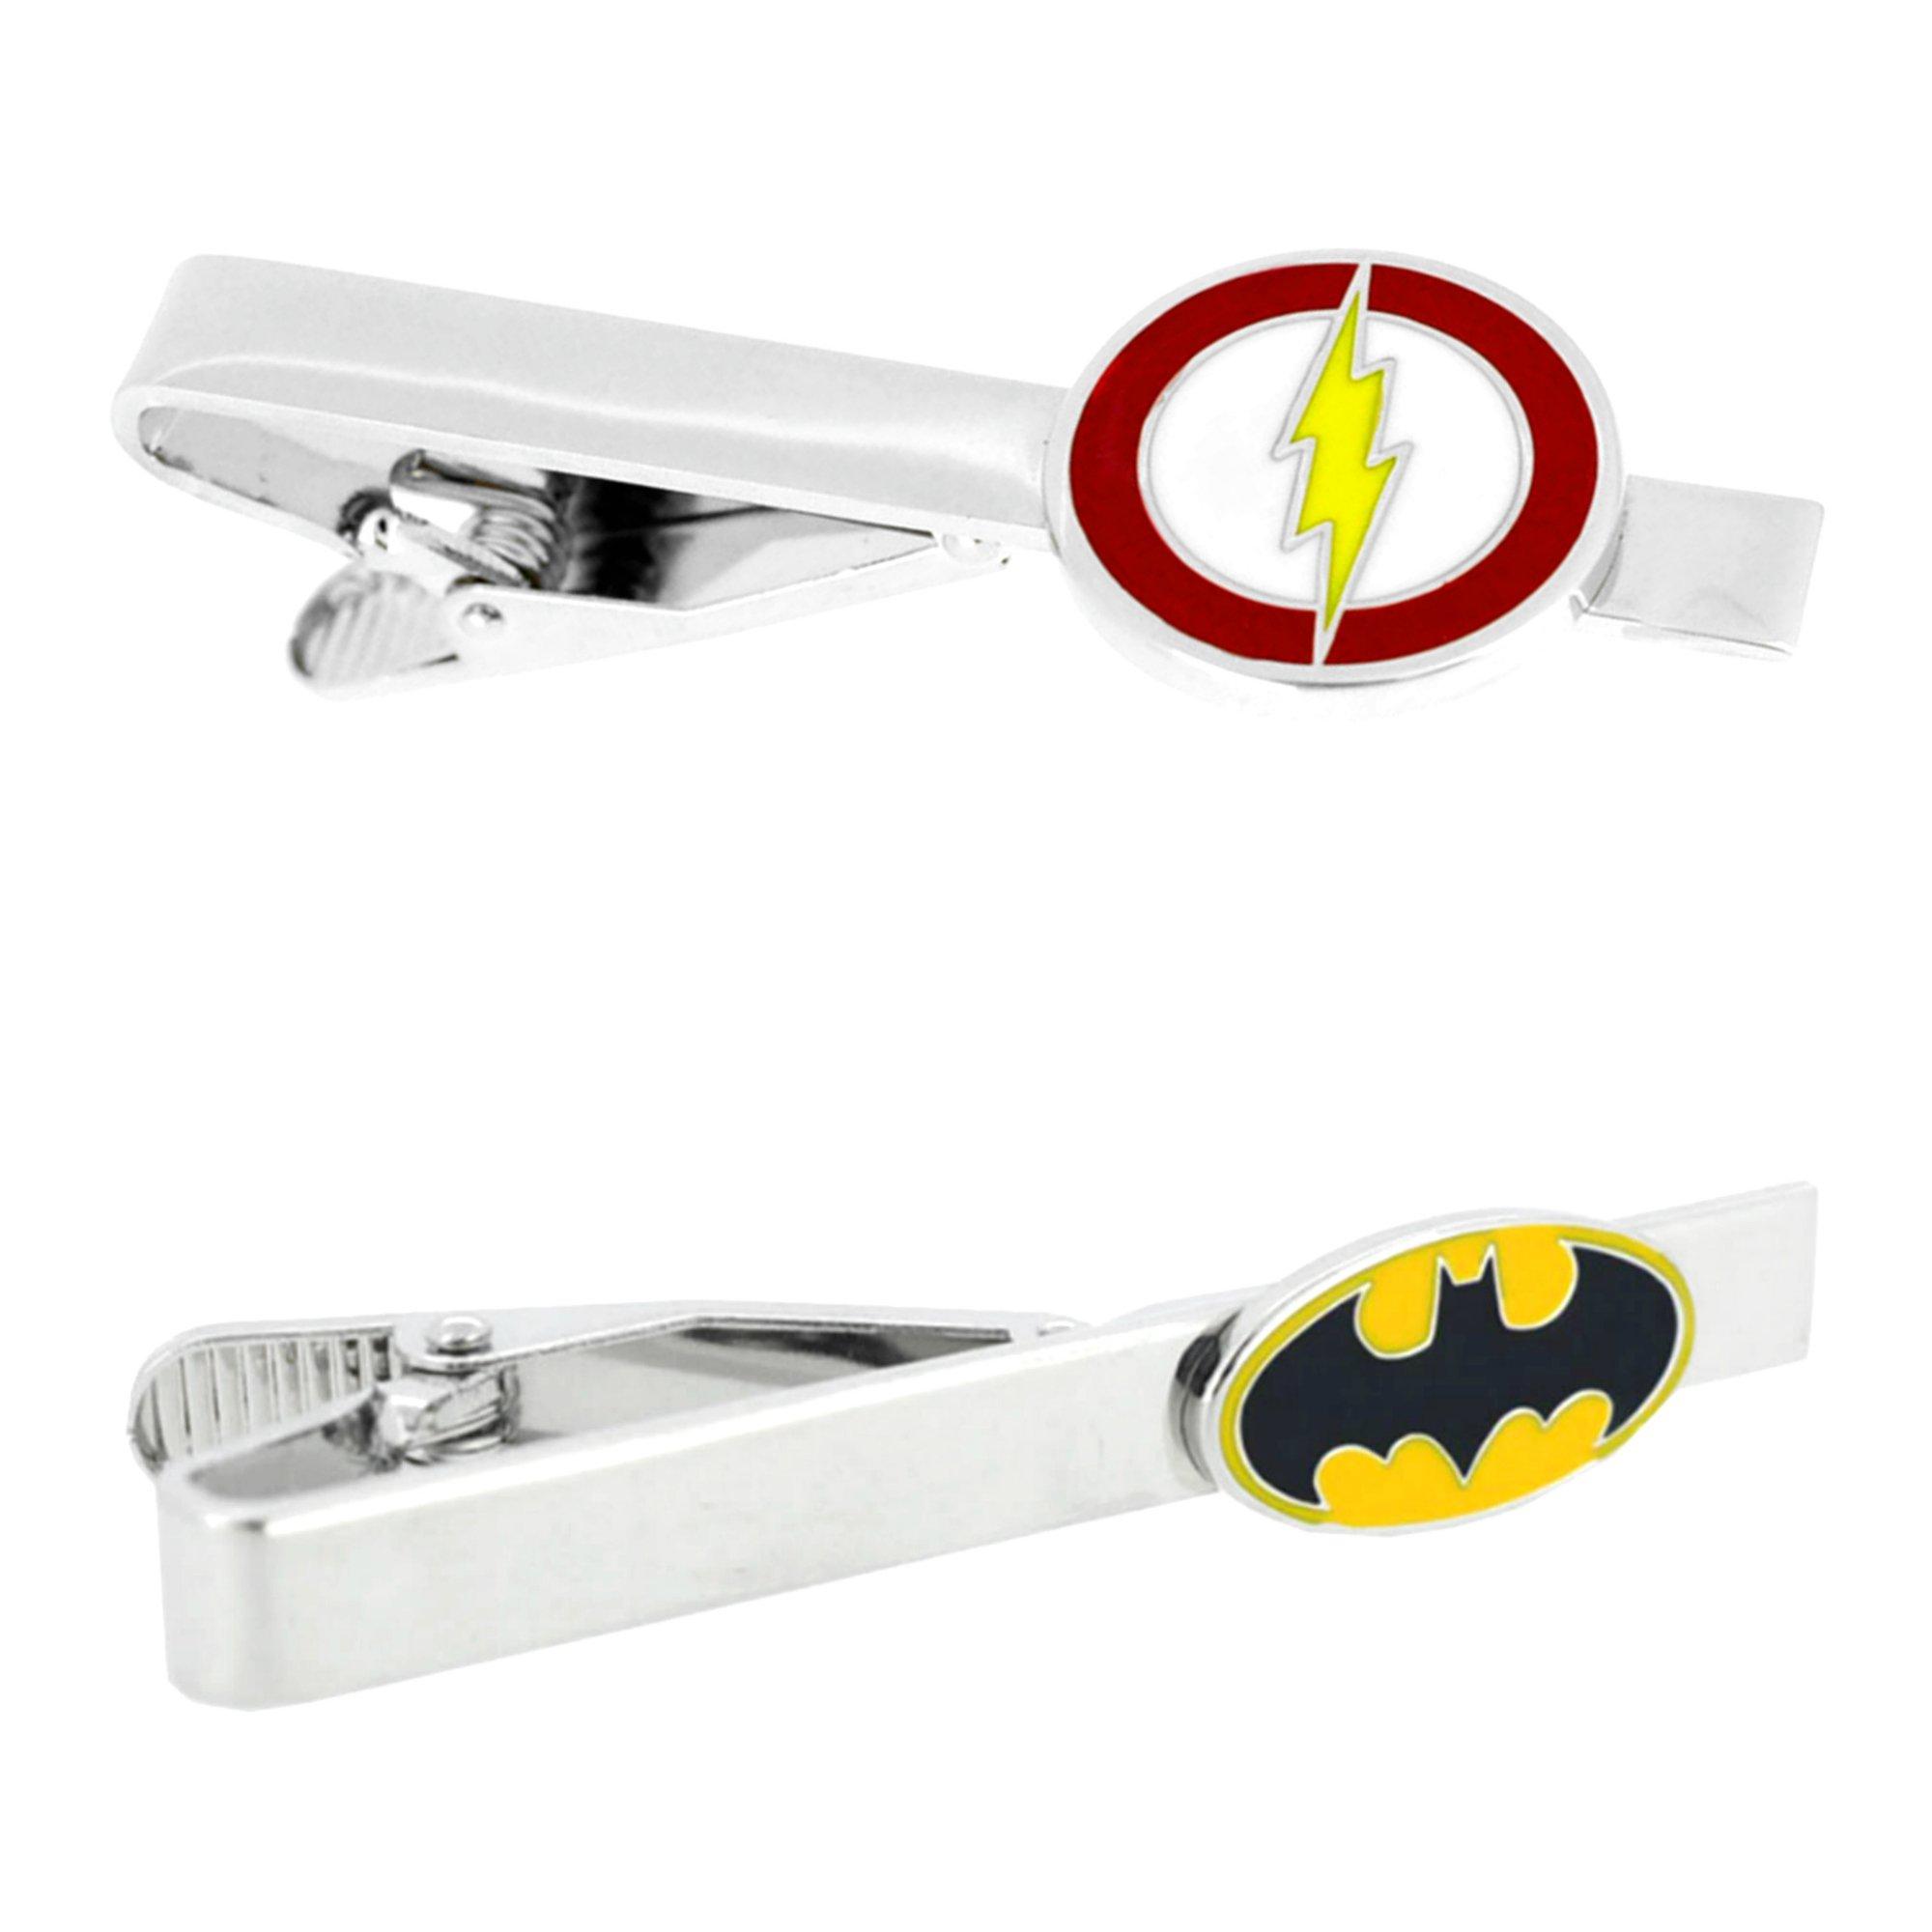 Outlander DC Comics - Flash & Batman - Tiebar Tie Clasp Set of 2 Wedding Superhero Logo w/Gift Box